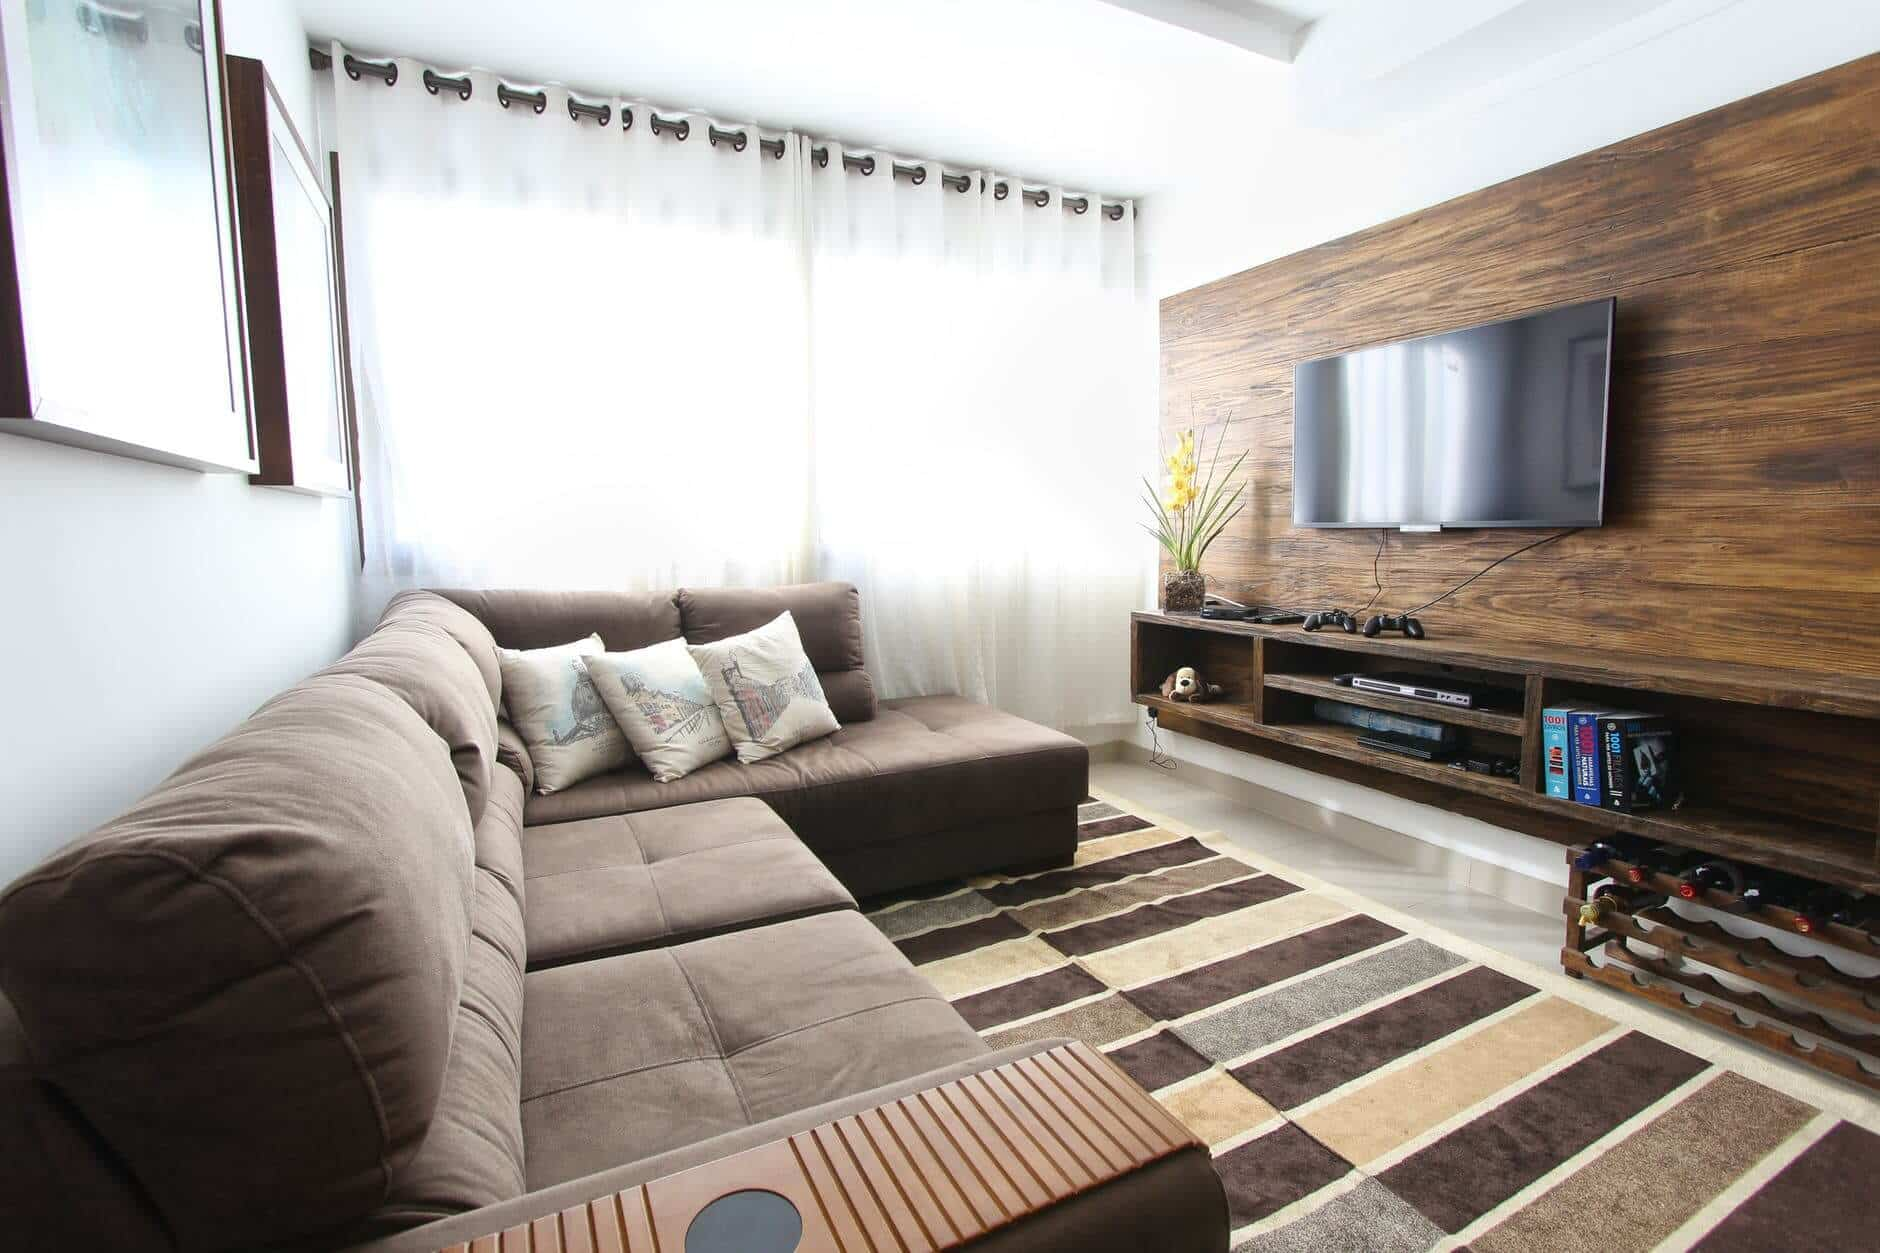 Rug Designs For Living Room 10